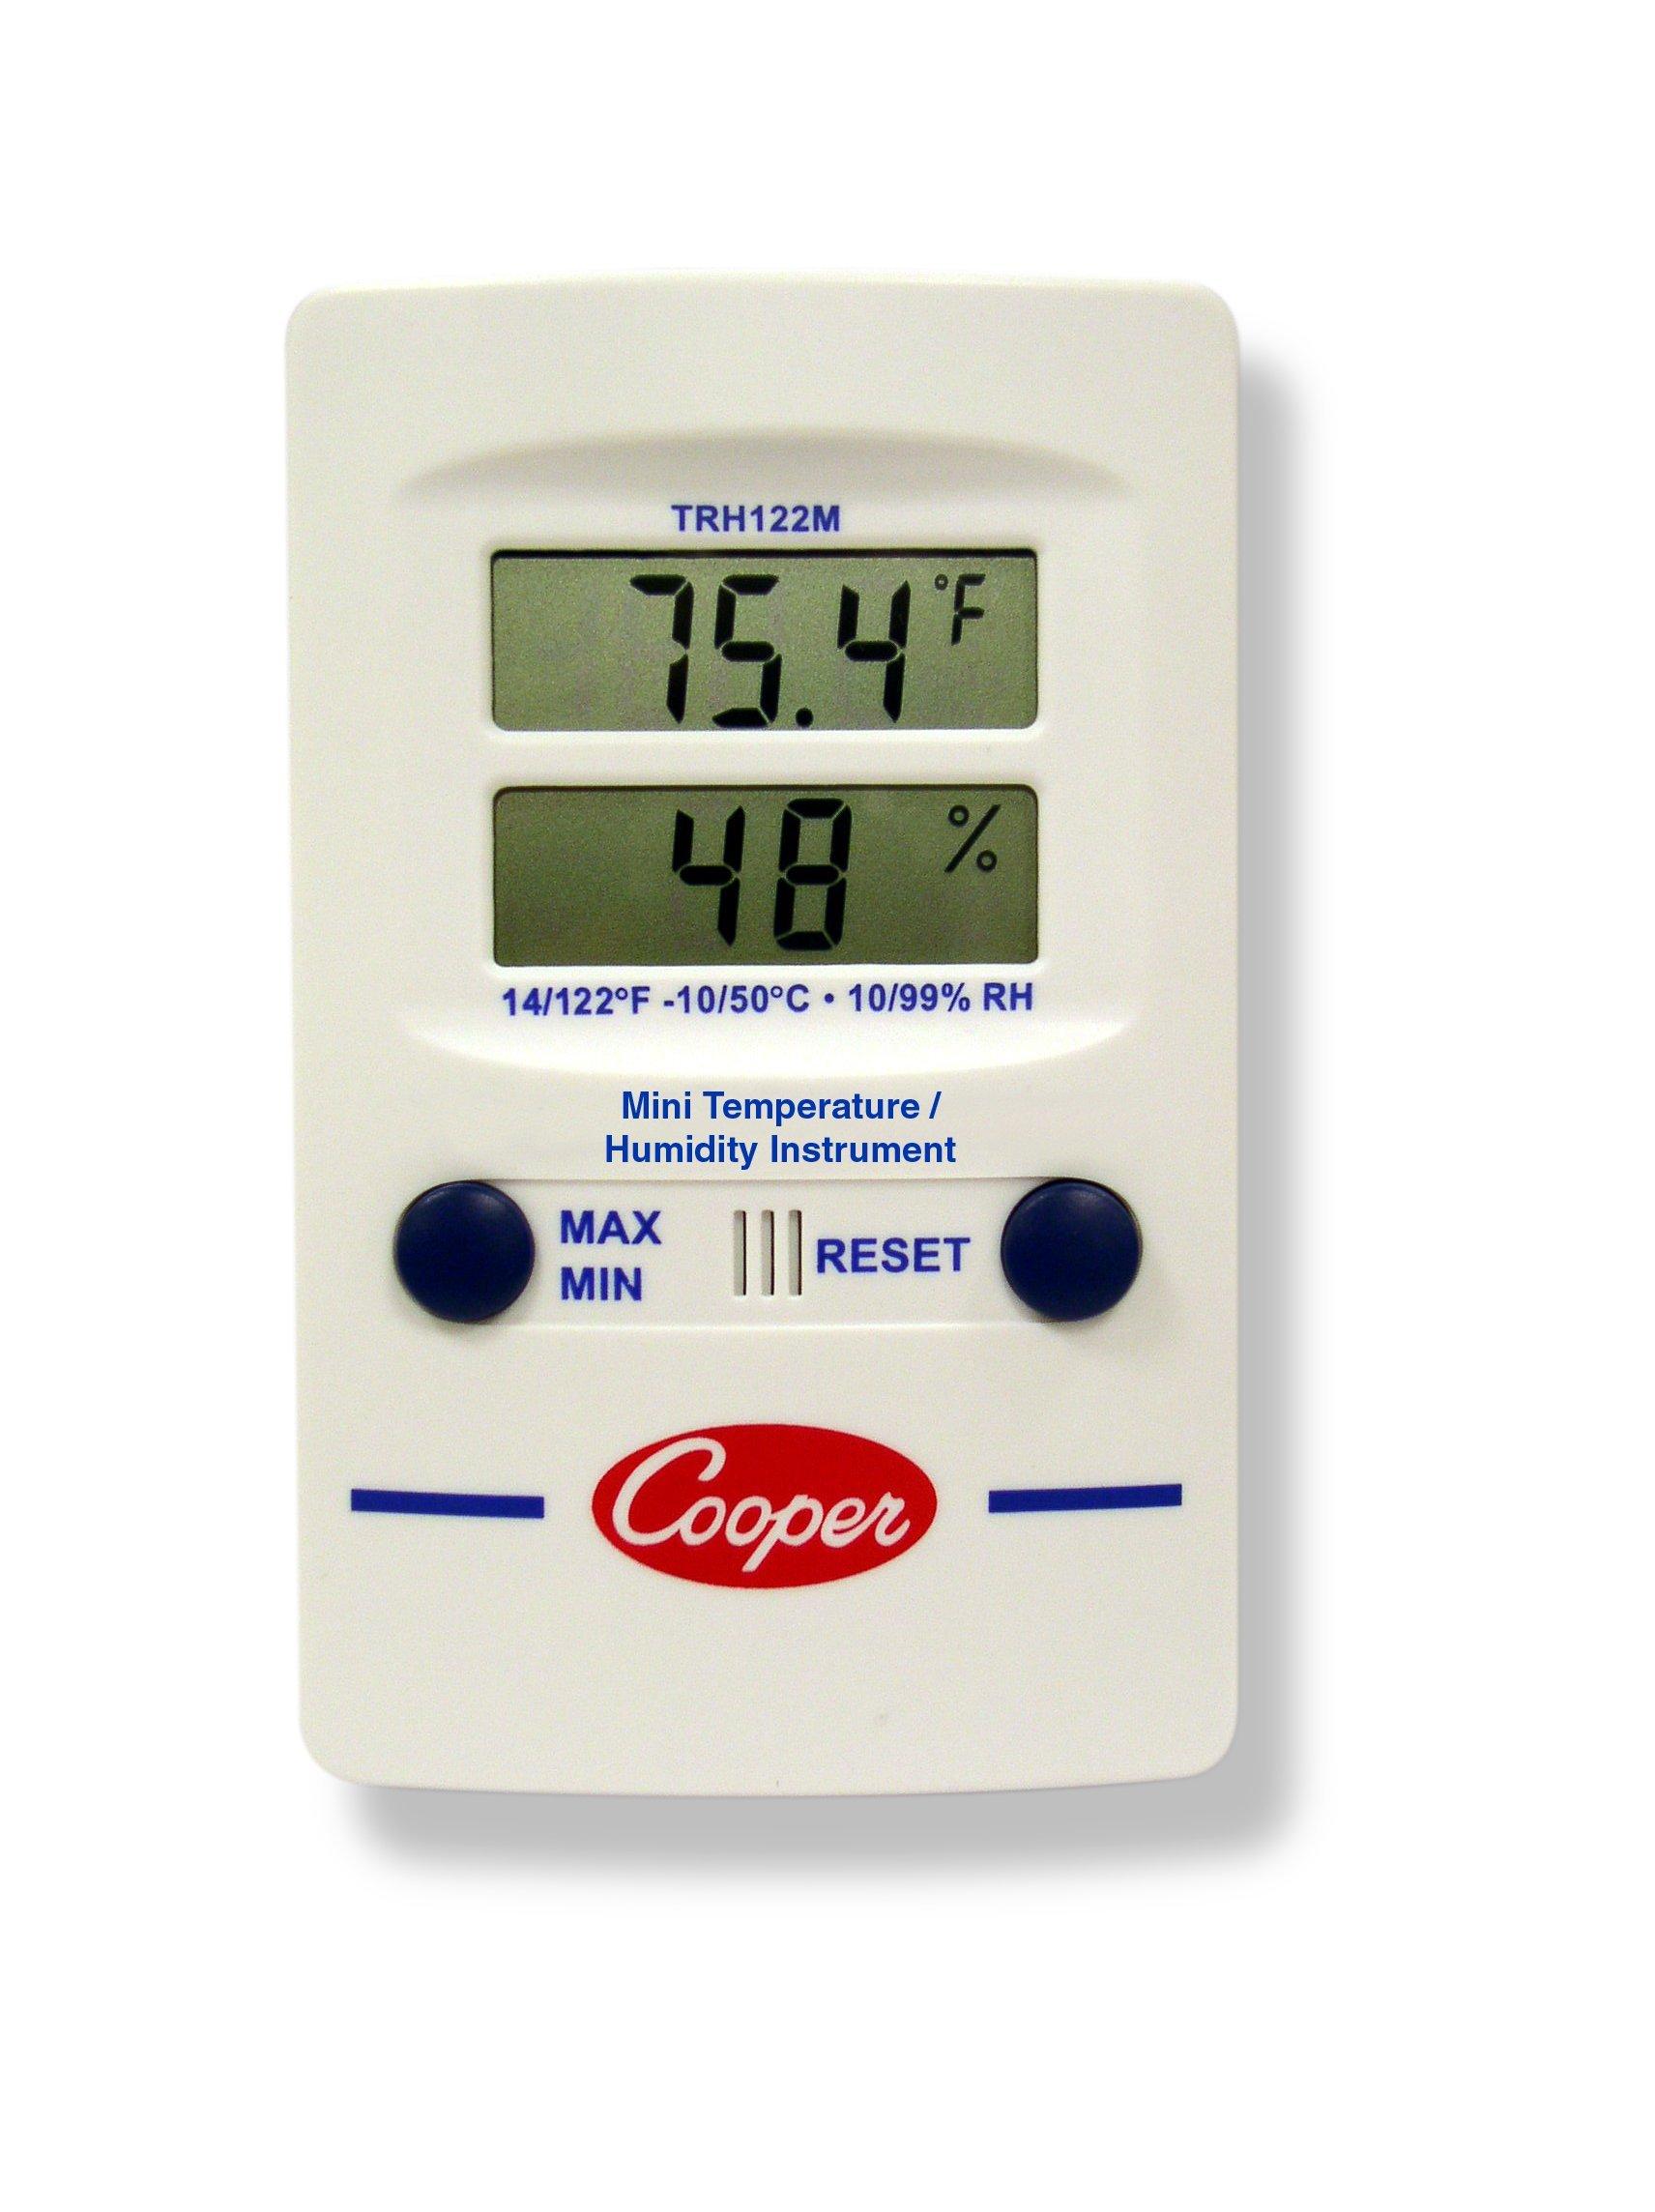 Cooper-Atkins TRH122M-0-8 Digital Mini Temperature/Humidity Dual-Display Wall Thermometer, 14/122° F Temperature Range by Cooper